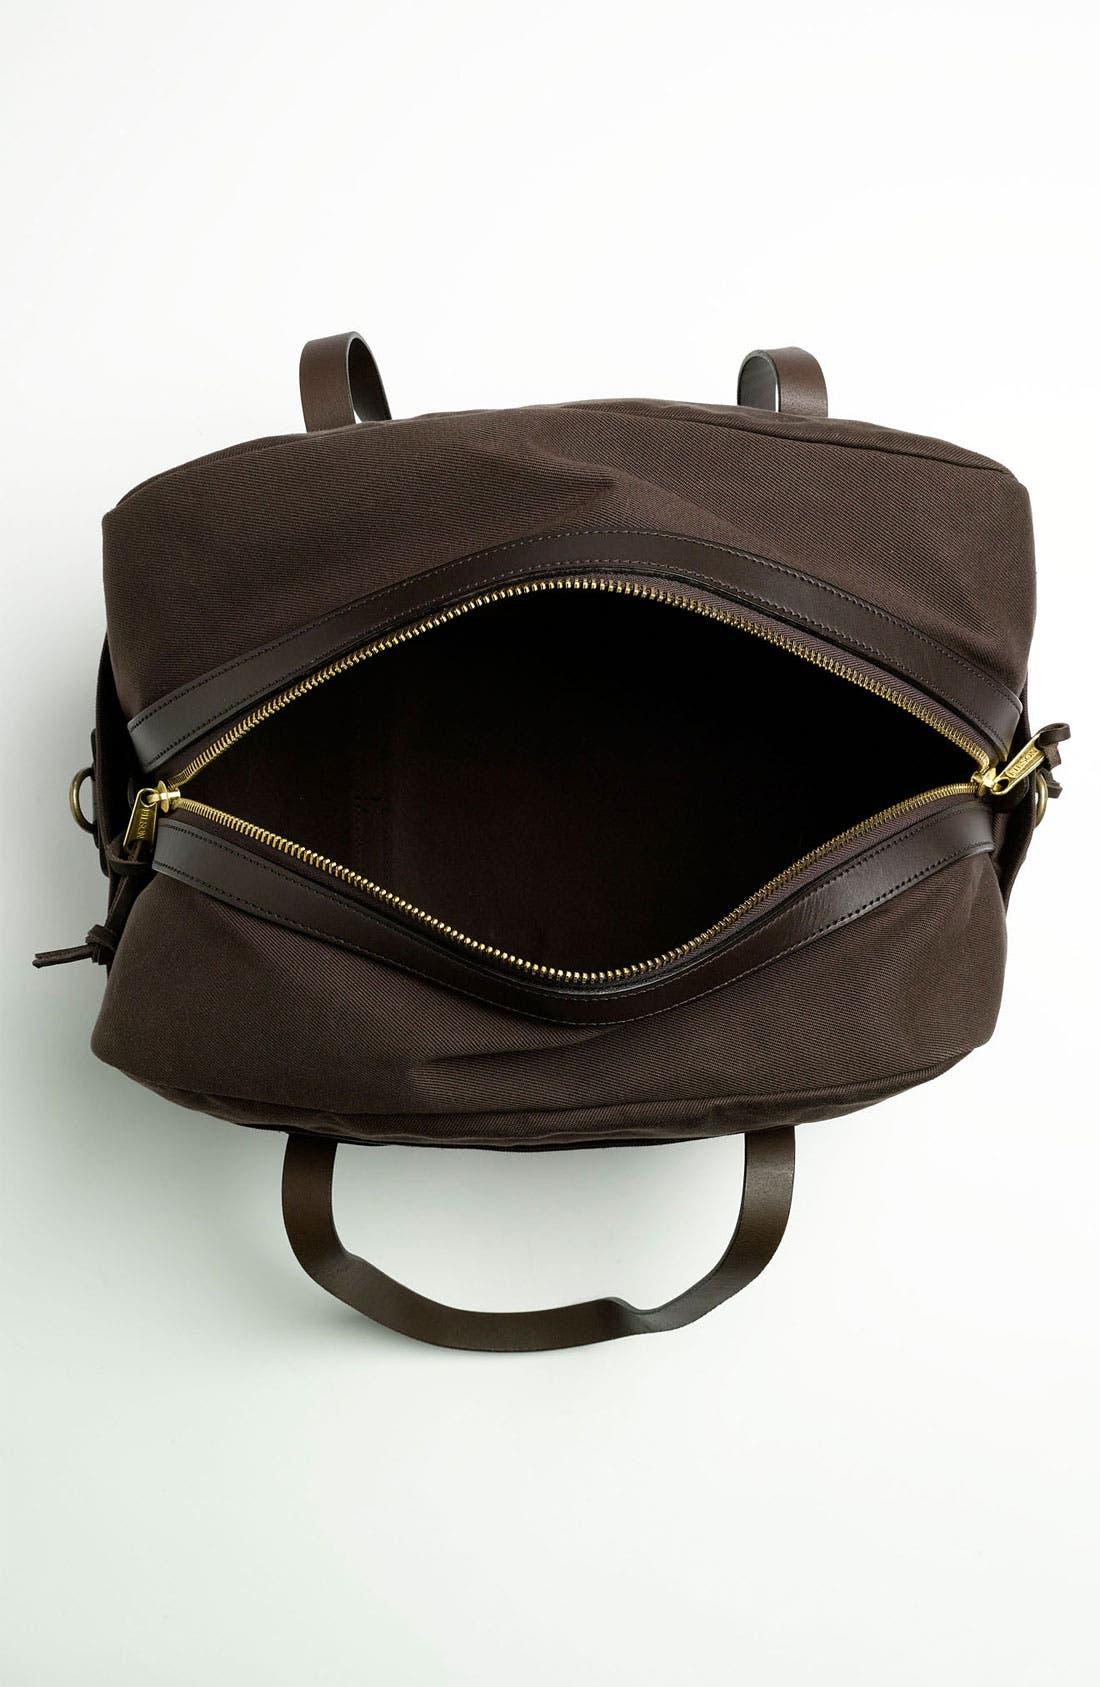 Medium Travel Bag,                             Alternate thumbnail 4, color,                             200